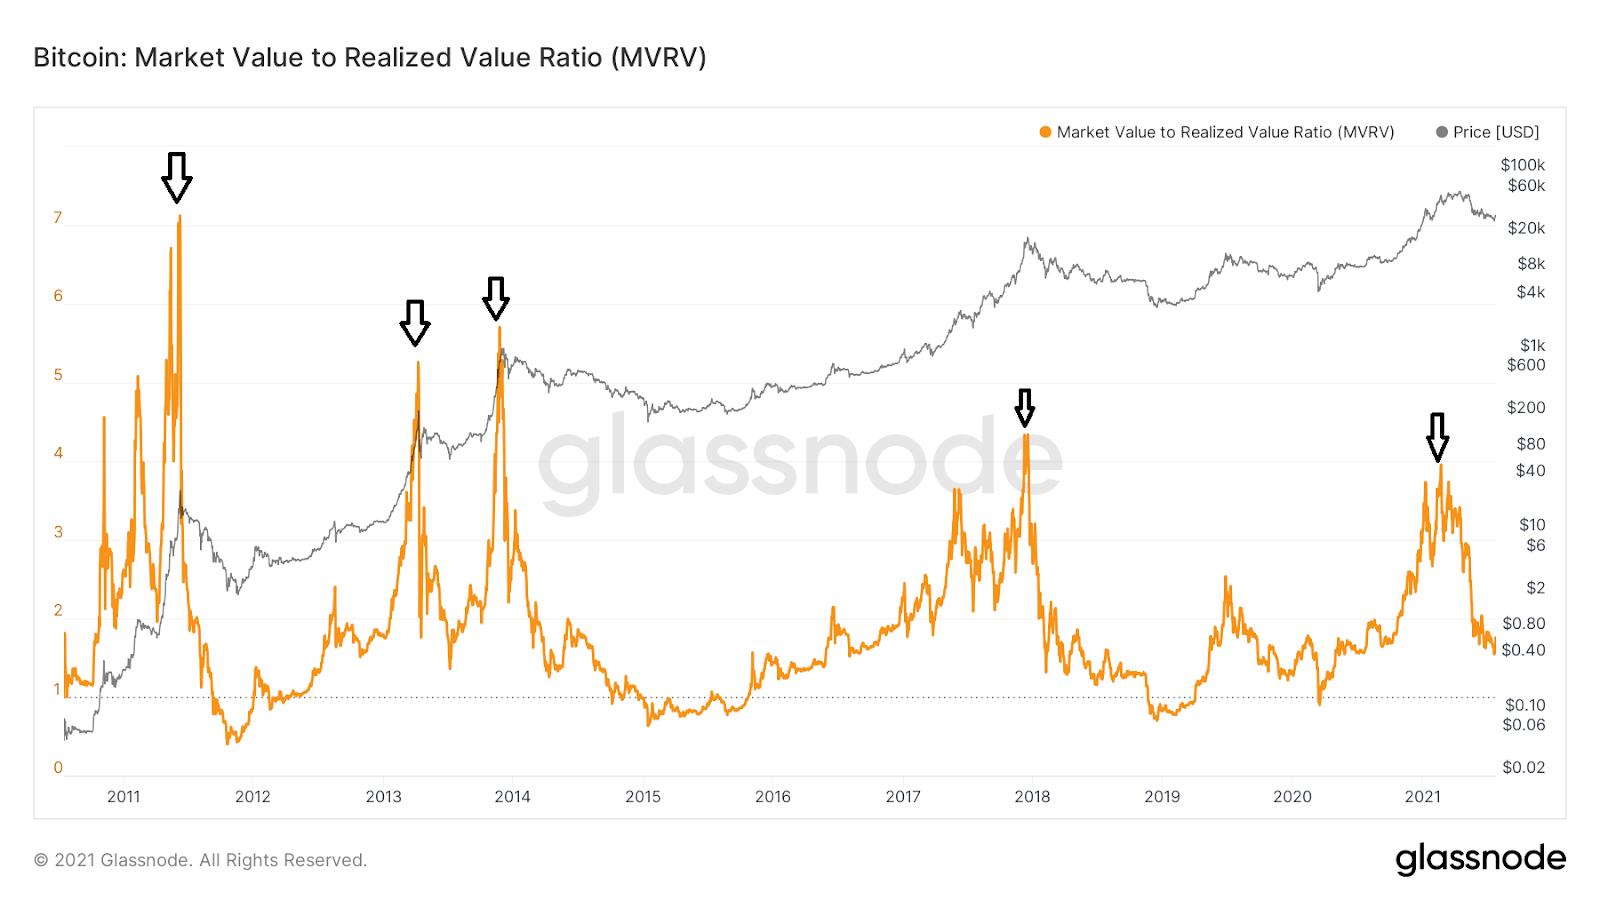 MVRV ratio